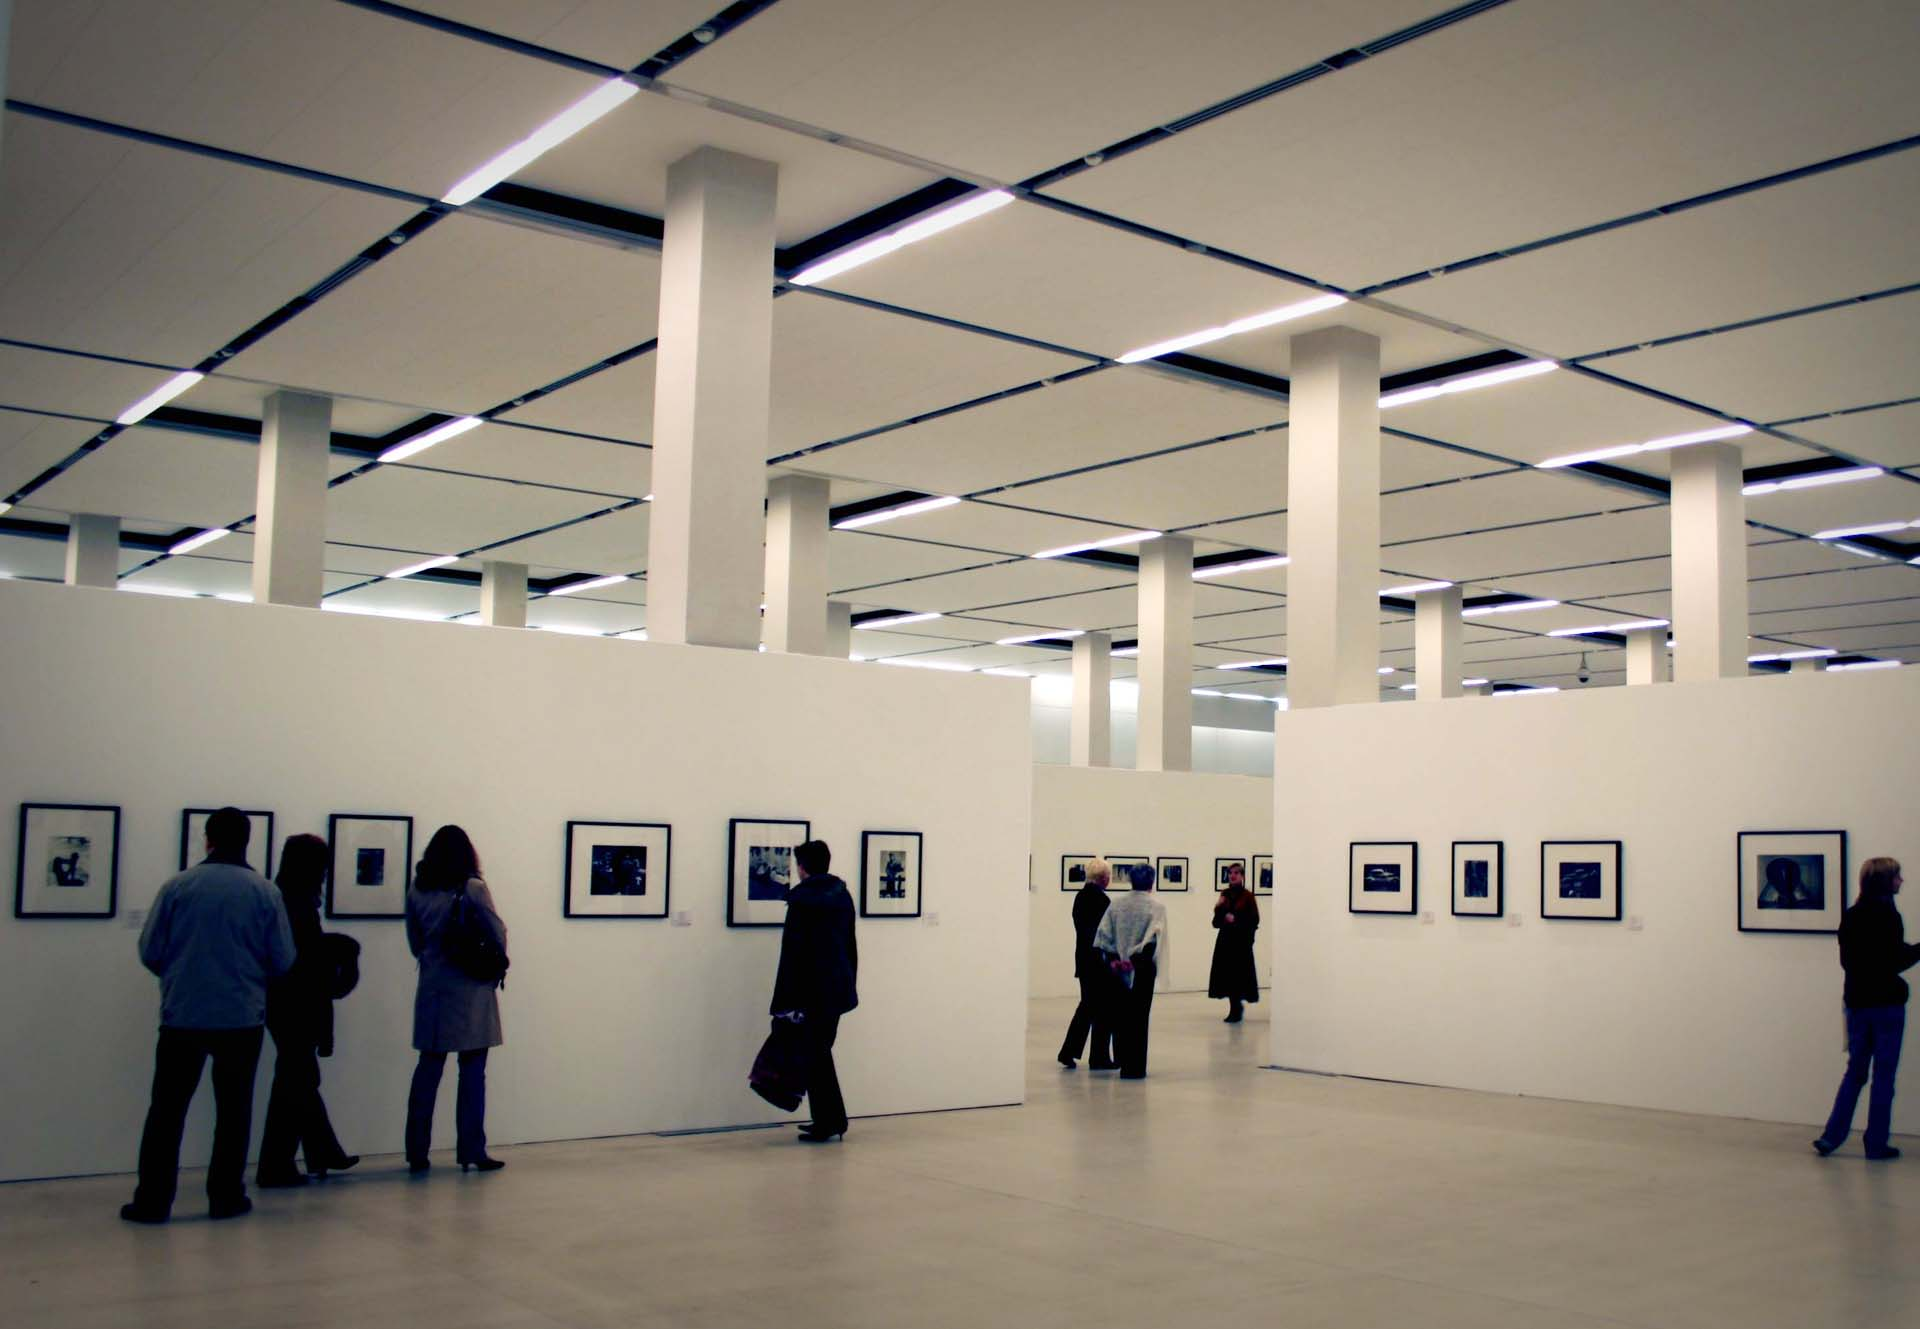 art-exhibition-walls.jpg?time=1563399752